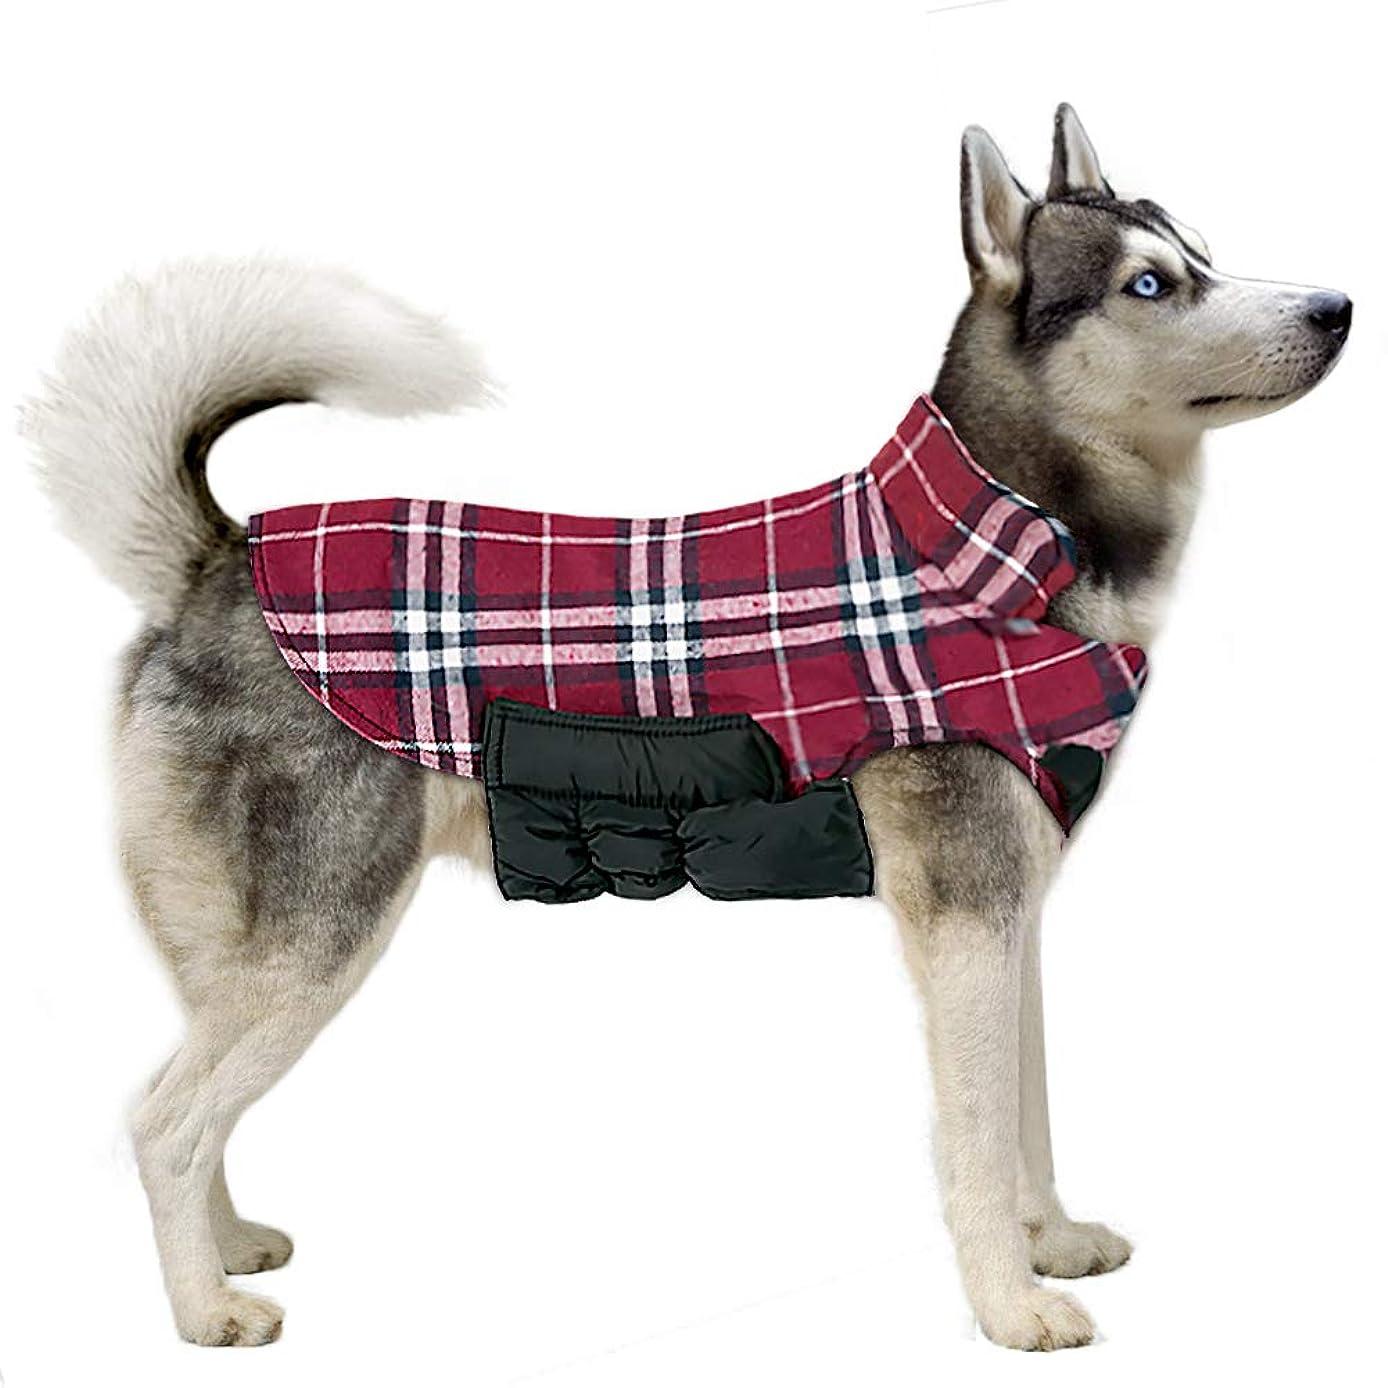 TPYQdirect Dog Jacket, Waterproof Windproof Reversible British Style Plaid Dog Vest Winter Coat Warm Dog Apparel Cold Weather Dog Jacket Small Medium Large Dogs